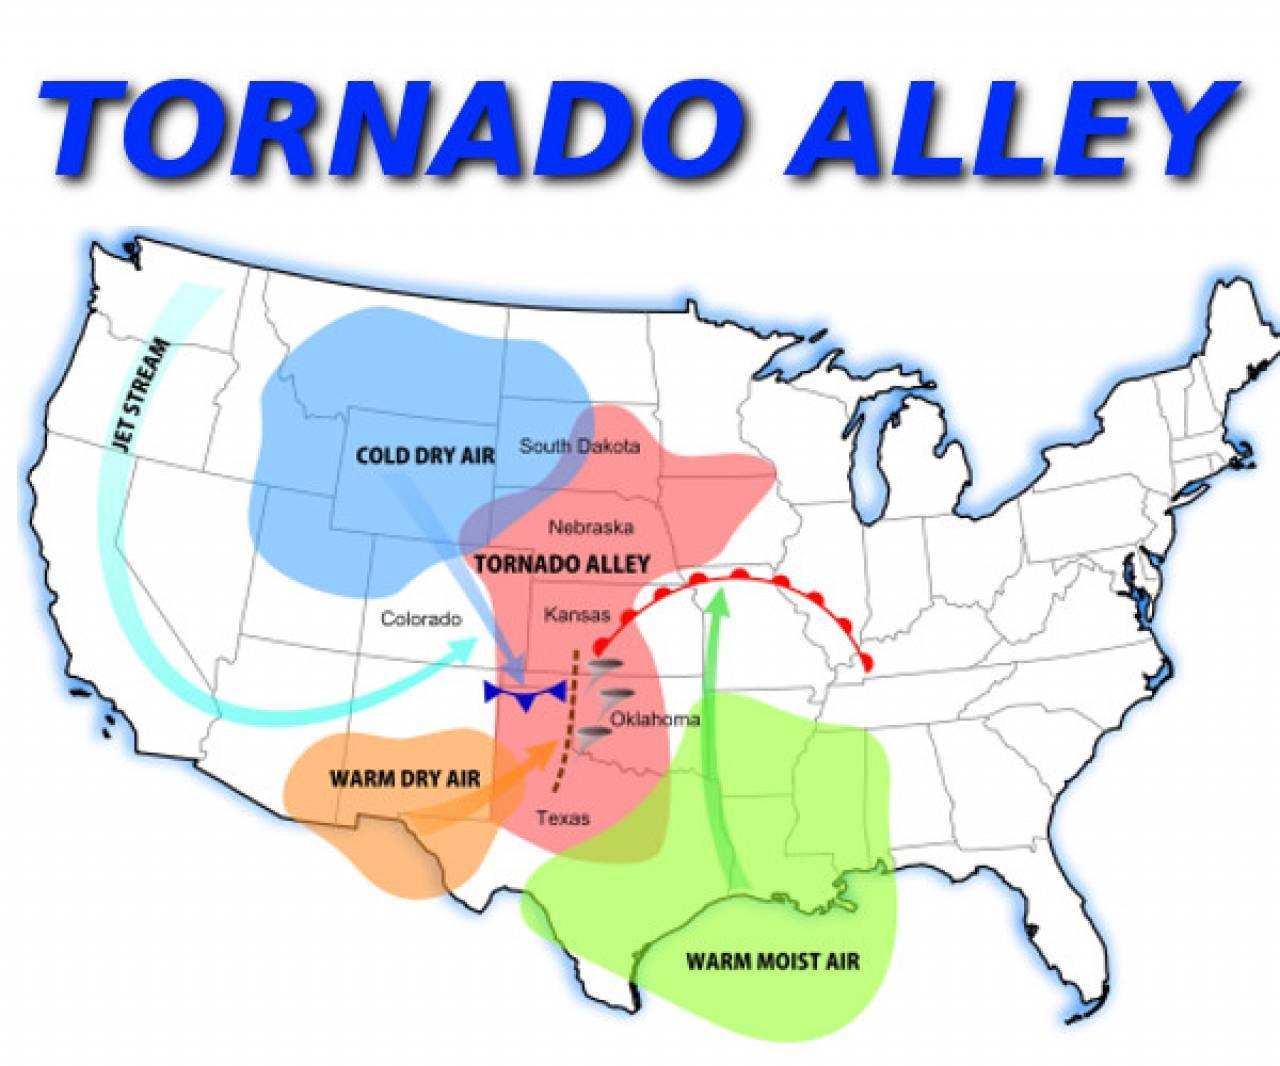 tornado map usa with Tornado Alley La Pista Di Atteraggio Dei Tornado 62048 on Watch likewise Art furthermore Photos in addition Nuclear Plants Risk Us besides Tornado Alley La Pista Di Atteraggio Dei Tornado 62048.